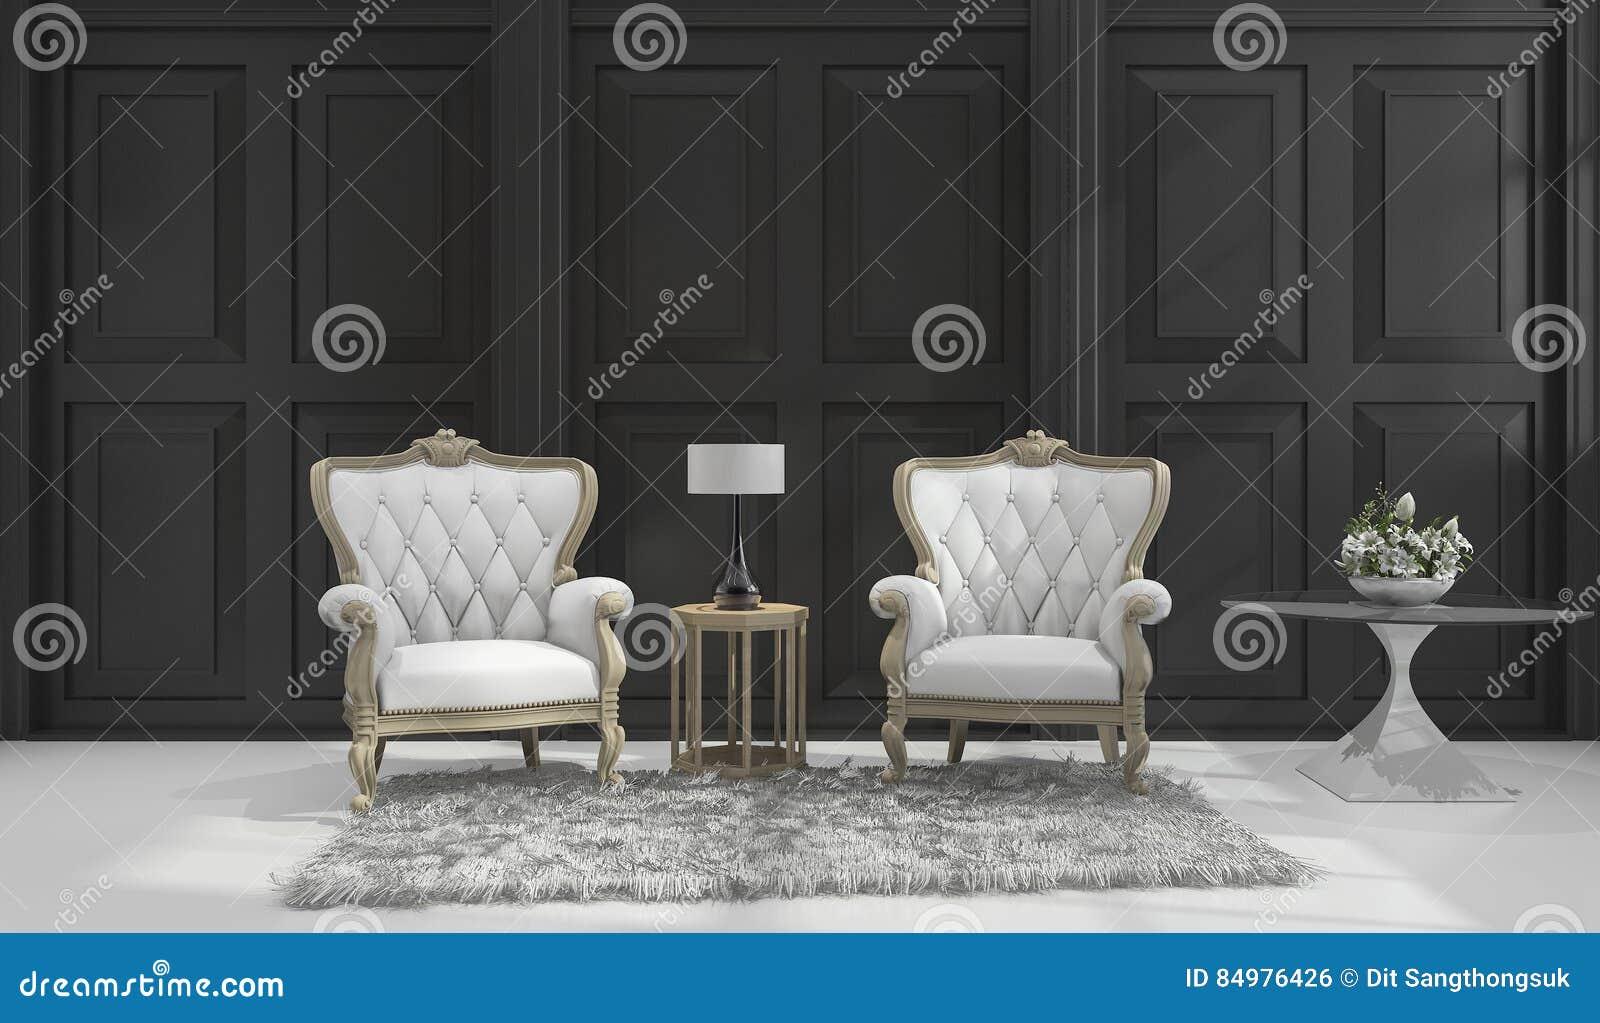 3d Rendering Classic Armchair In Black Classic Room Stock